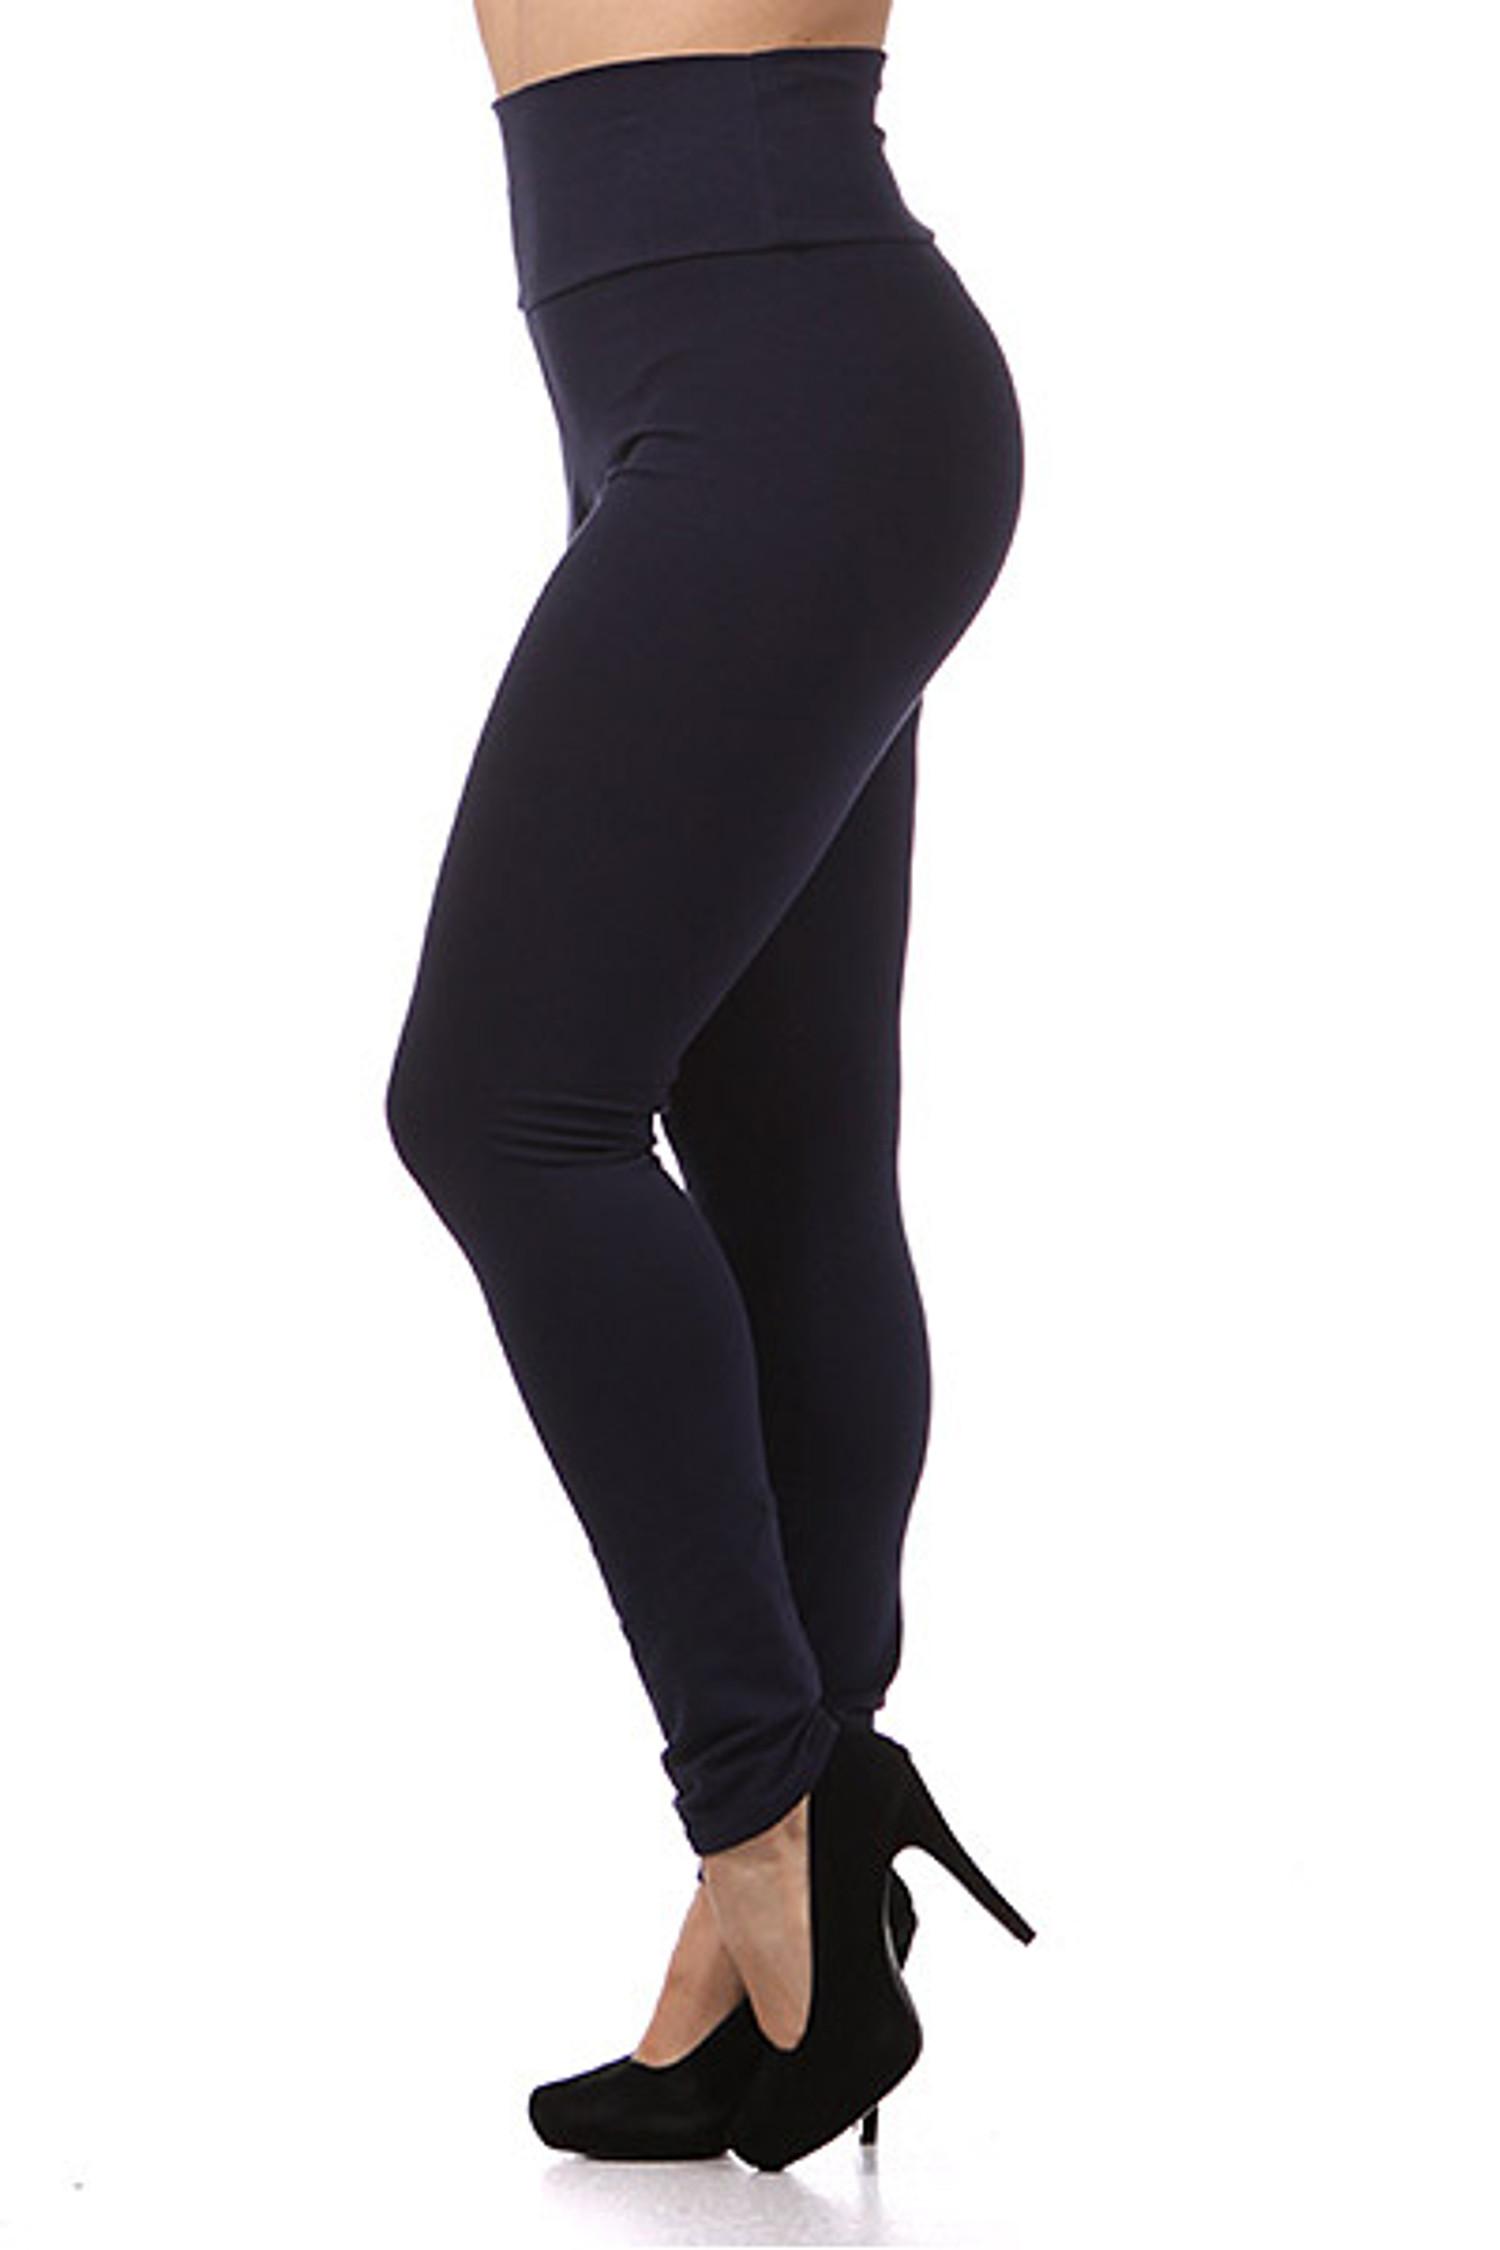 High Waist Cotton Plus Size Leggings